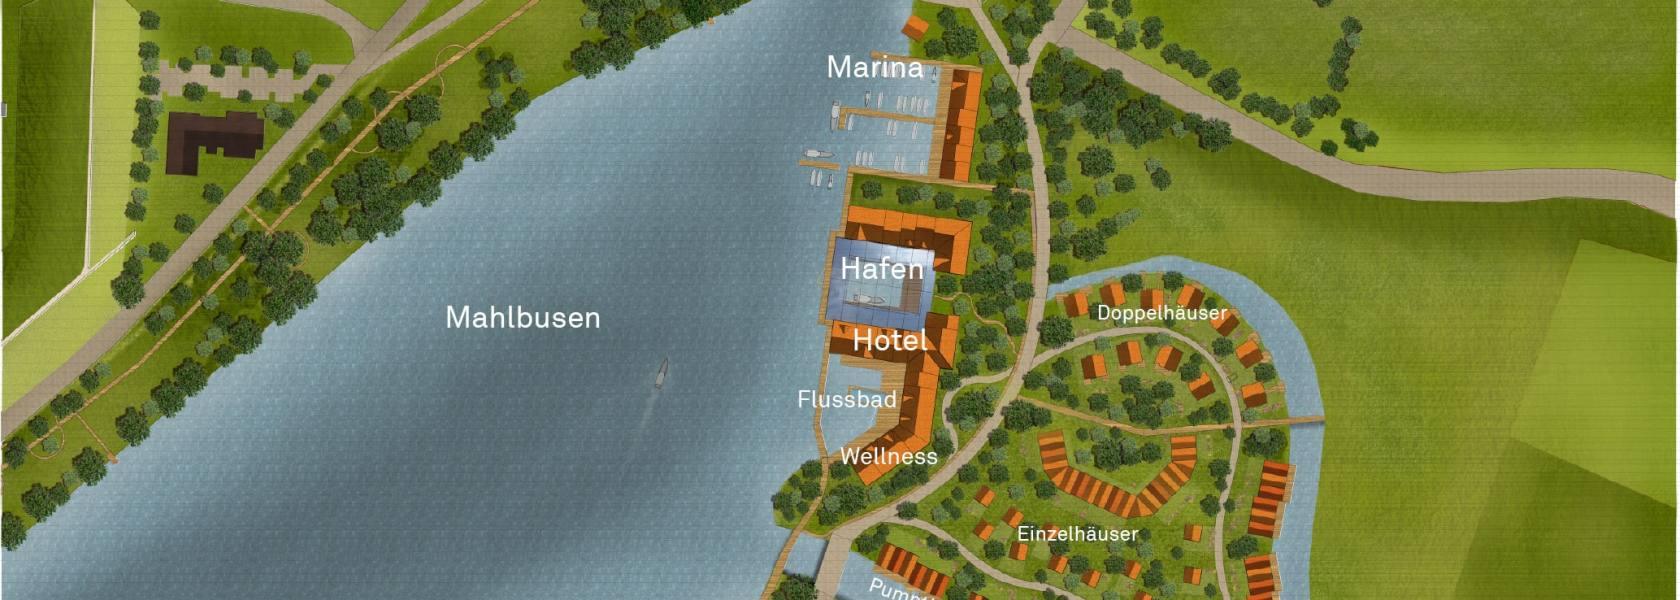 Mahlbusenprojekt, © Mahlbusen Projektentwicklungsgesellschaft mbH